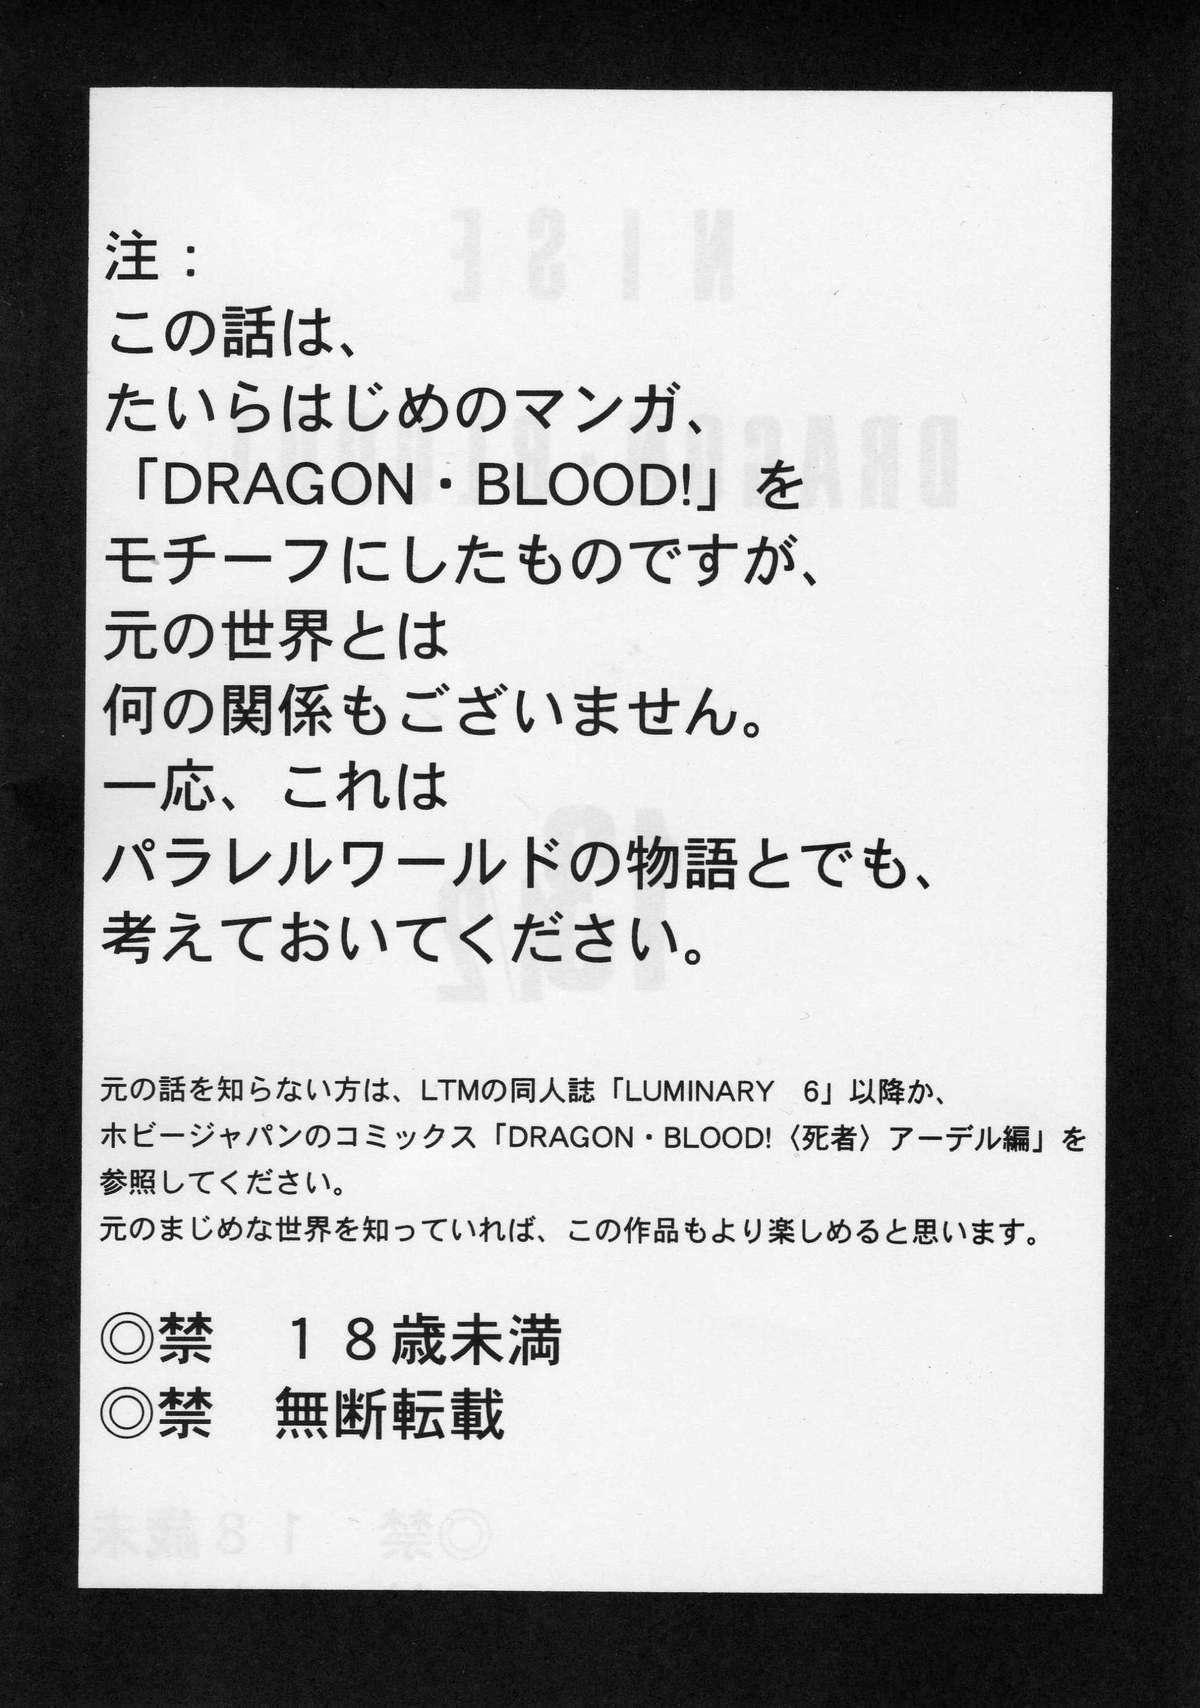 Nise Dragon Blood! 13 1/2 2